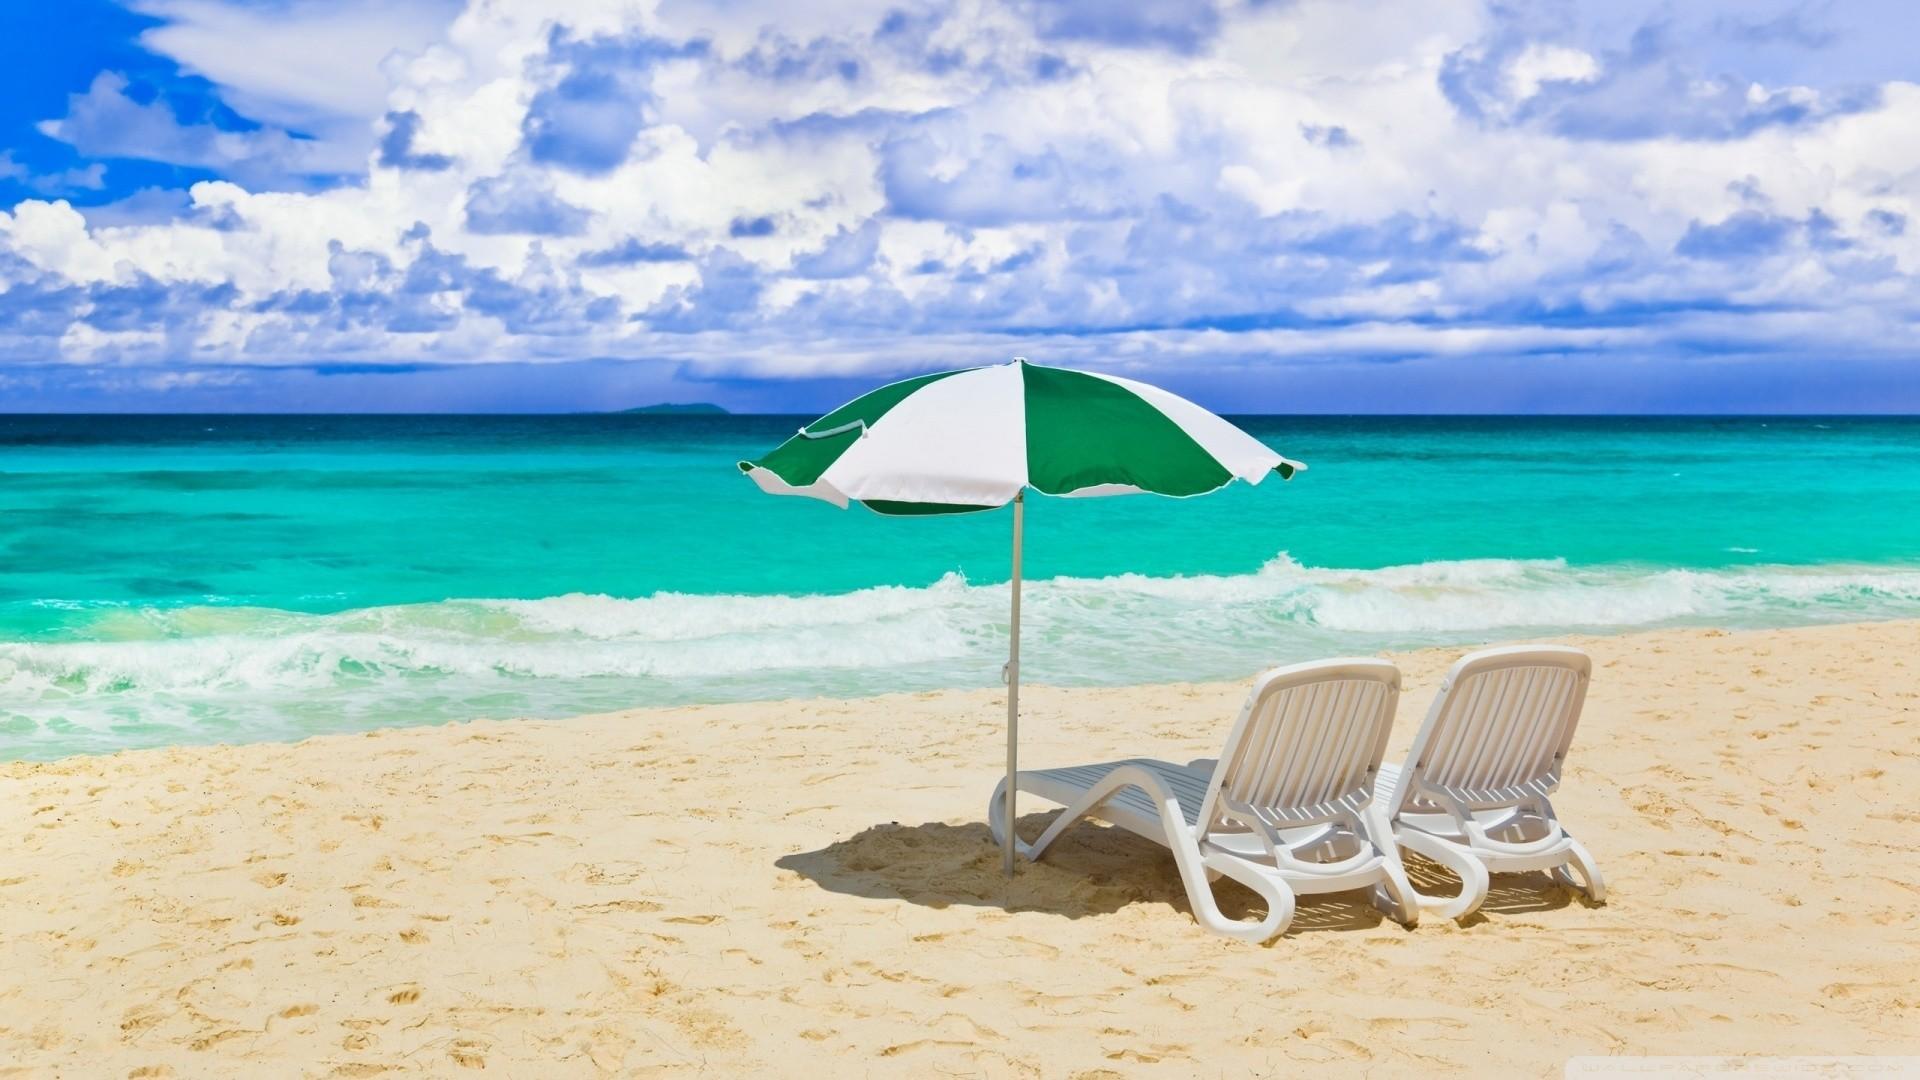 Beach HD Wallpapers. Beach HD Wallpapers 1920×1080